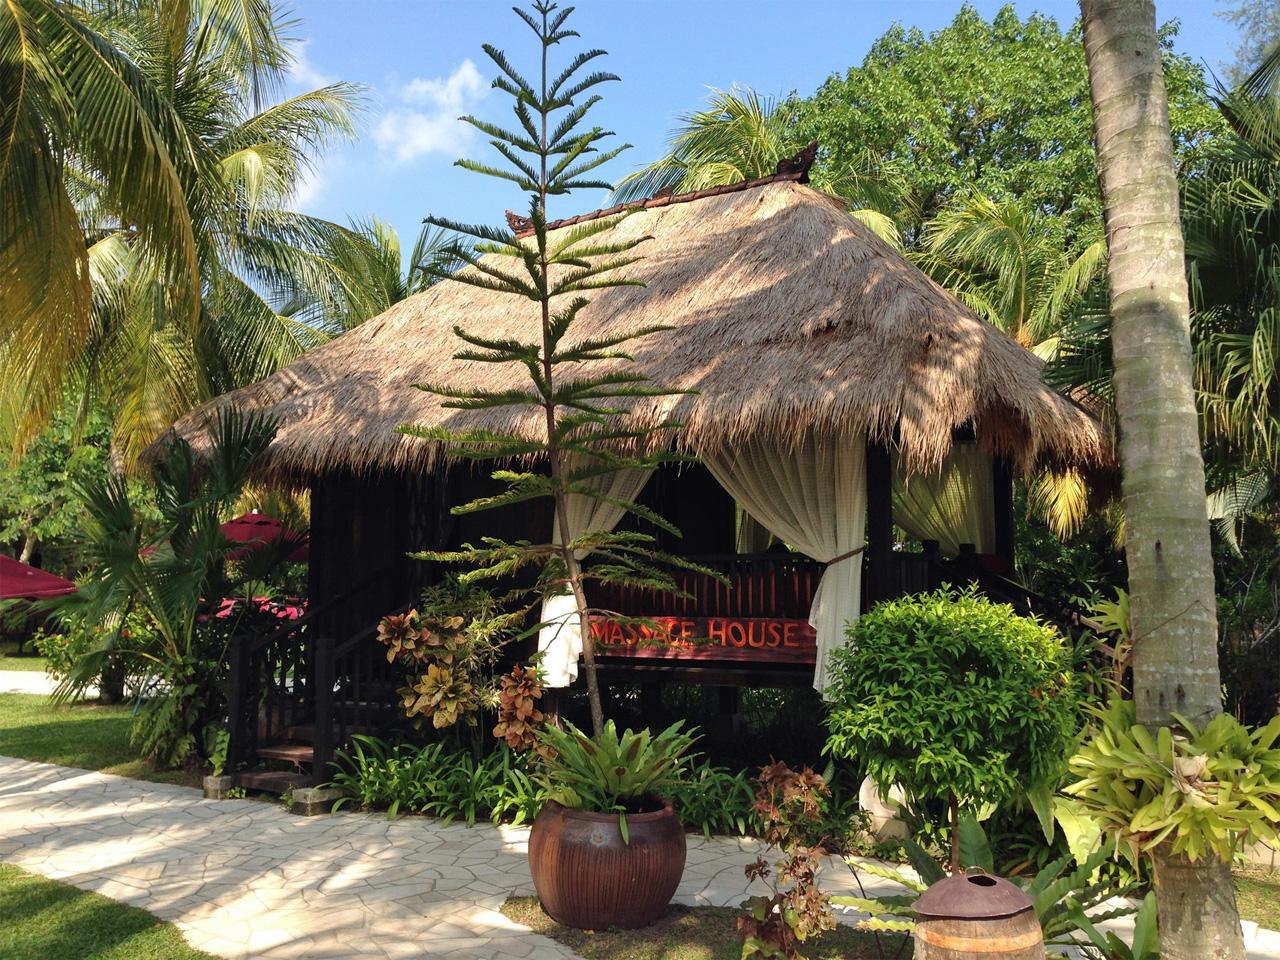 Parkroyal-Penang-Resort-Massage-House